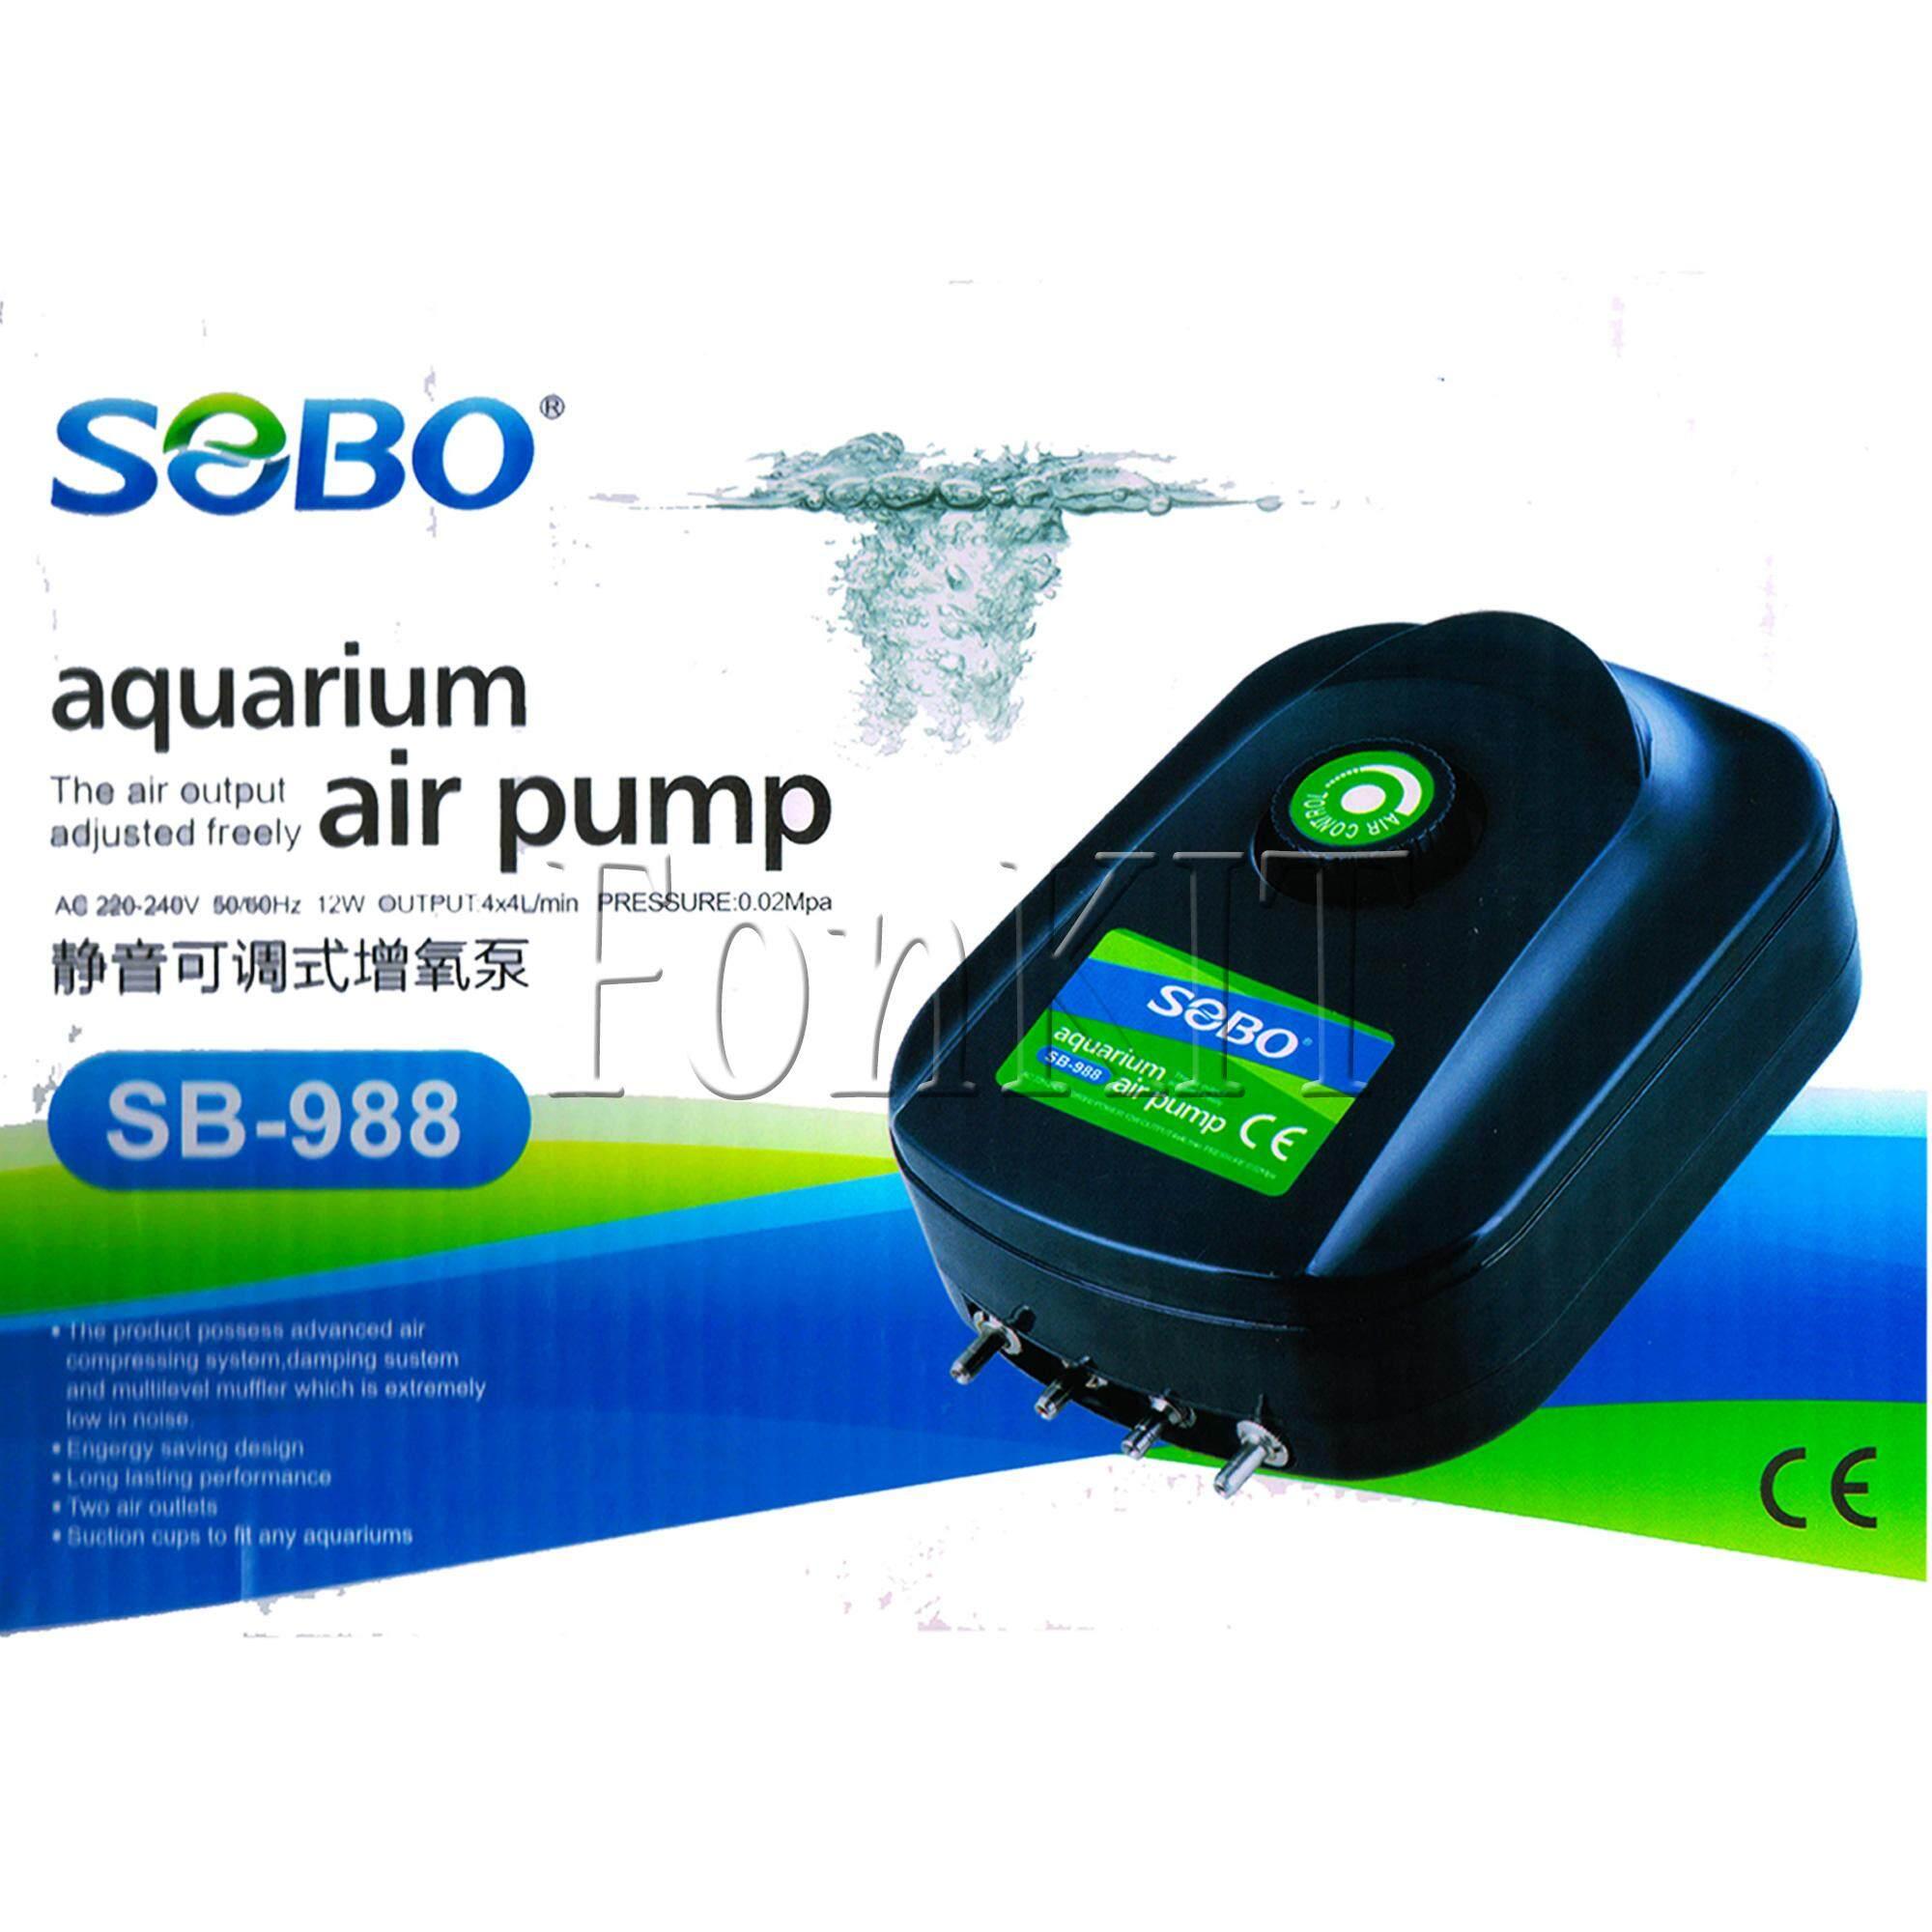 SOBO ปั้มอ๊อกซิเจน ตู้ปลา ปั้มลม SB-988 เสียงเงียบ 4ทาง ขนาด 12W มีปุ่มโวลุมปรับแรงดันลมได้หลายระดับ OUTPUT 4x4L/min PRESSURE 4x0.02Mpa ใช้ไฟน้อย ประหยัดไฟ เลี้ยงปลา บ่อปลา กุ้ง เต่า ไม้น้ำ น้ำพุ ทำออกซิเจน ไม่มีเสียงรบกวน น้ำใส แรง สม่ำเสมอ ปลาทะเล